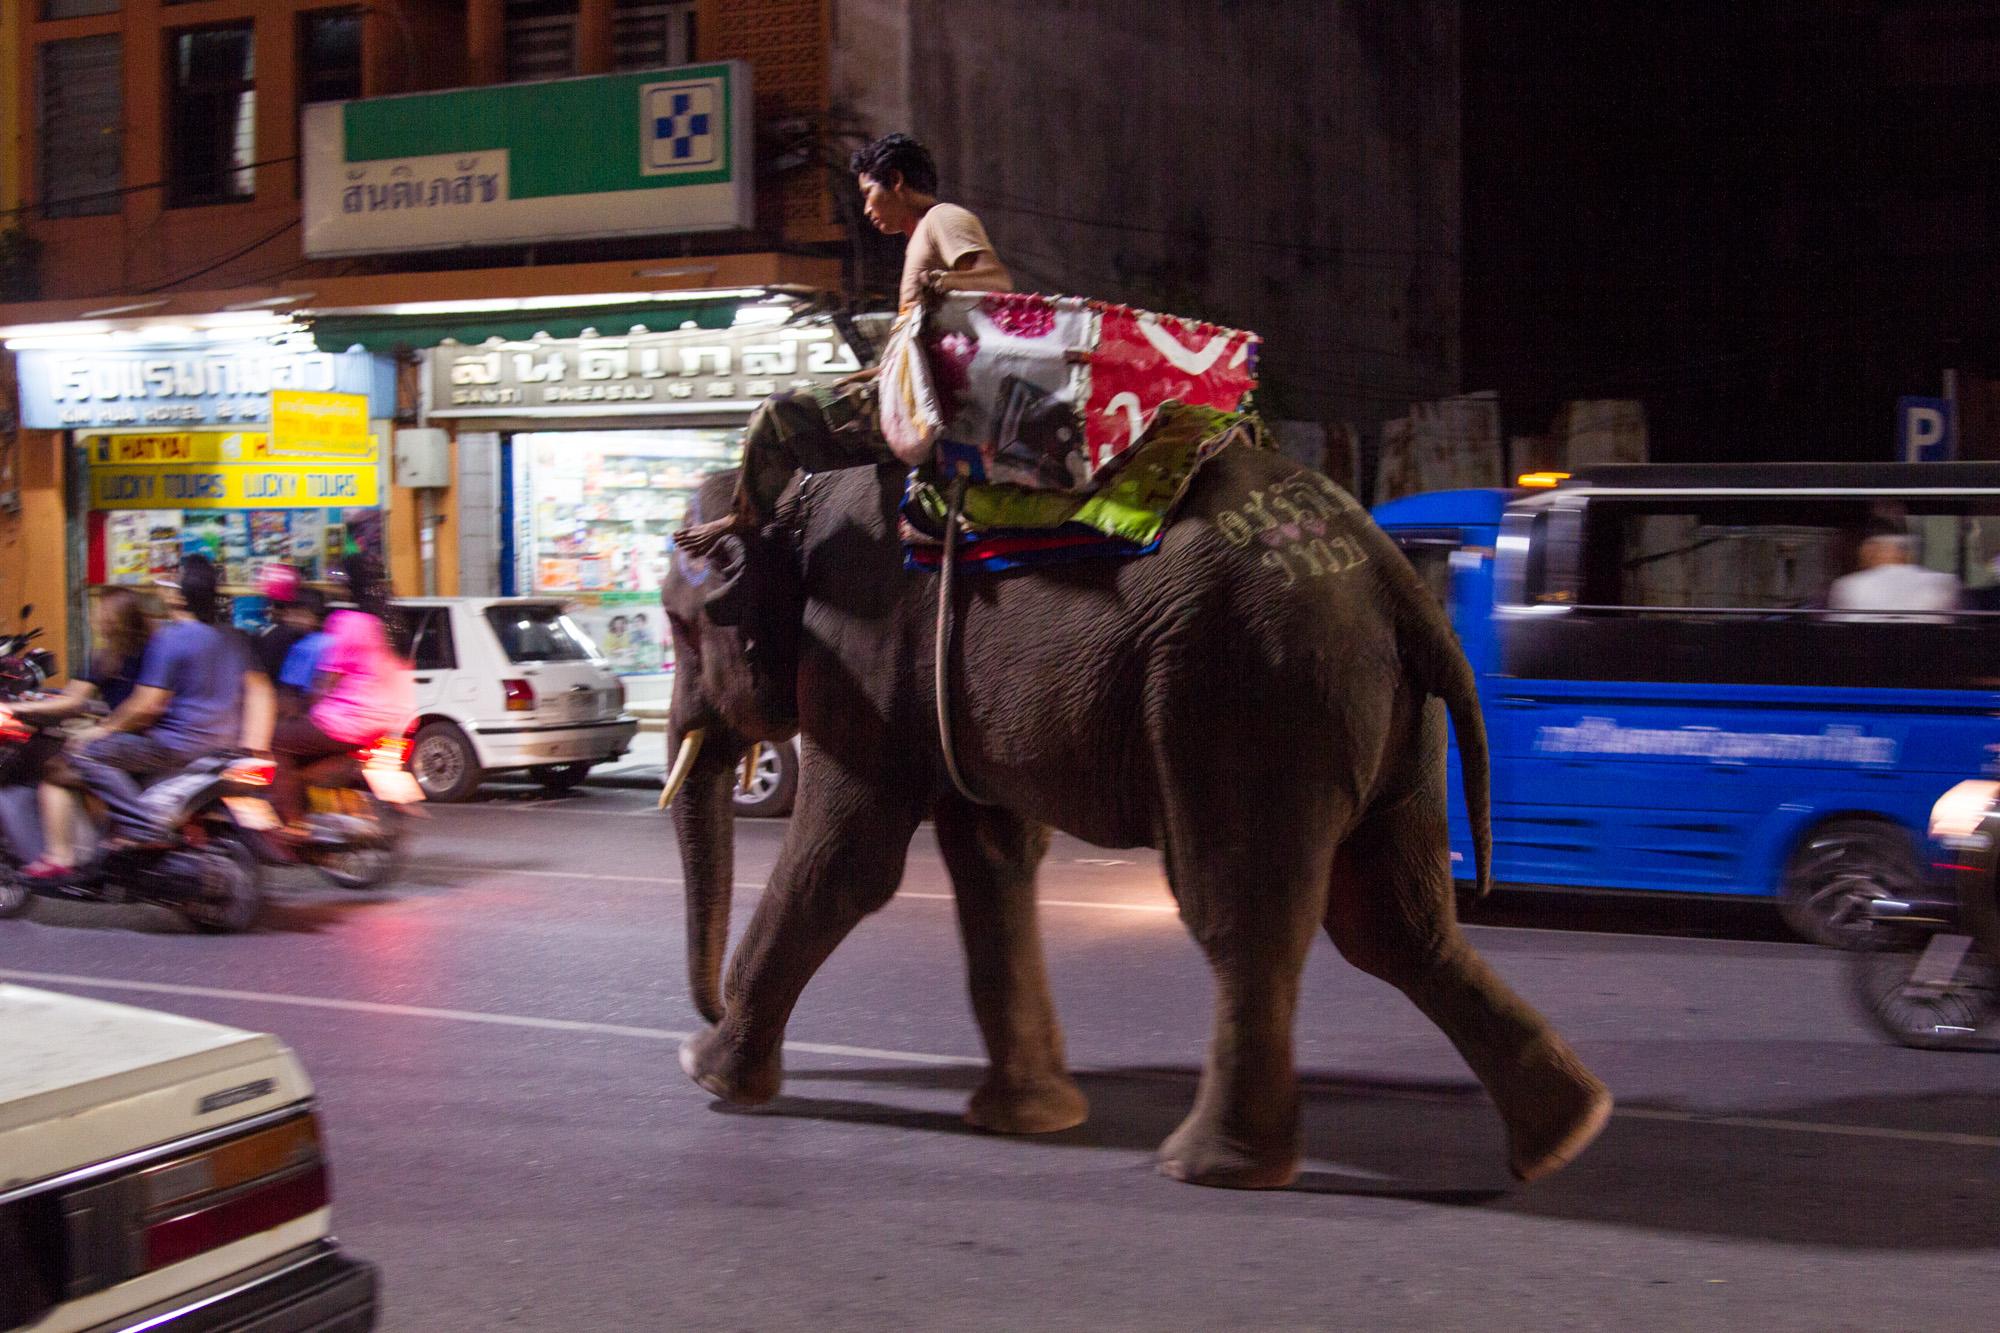 Elephant walking through the streets of Hatyai, Thailand.